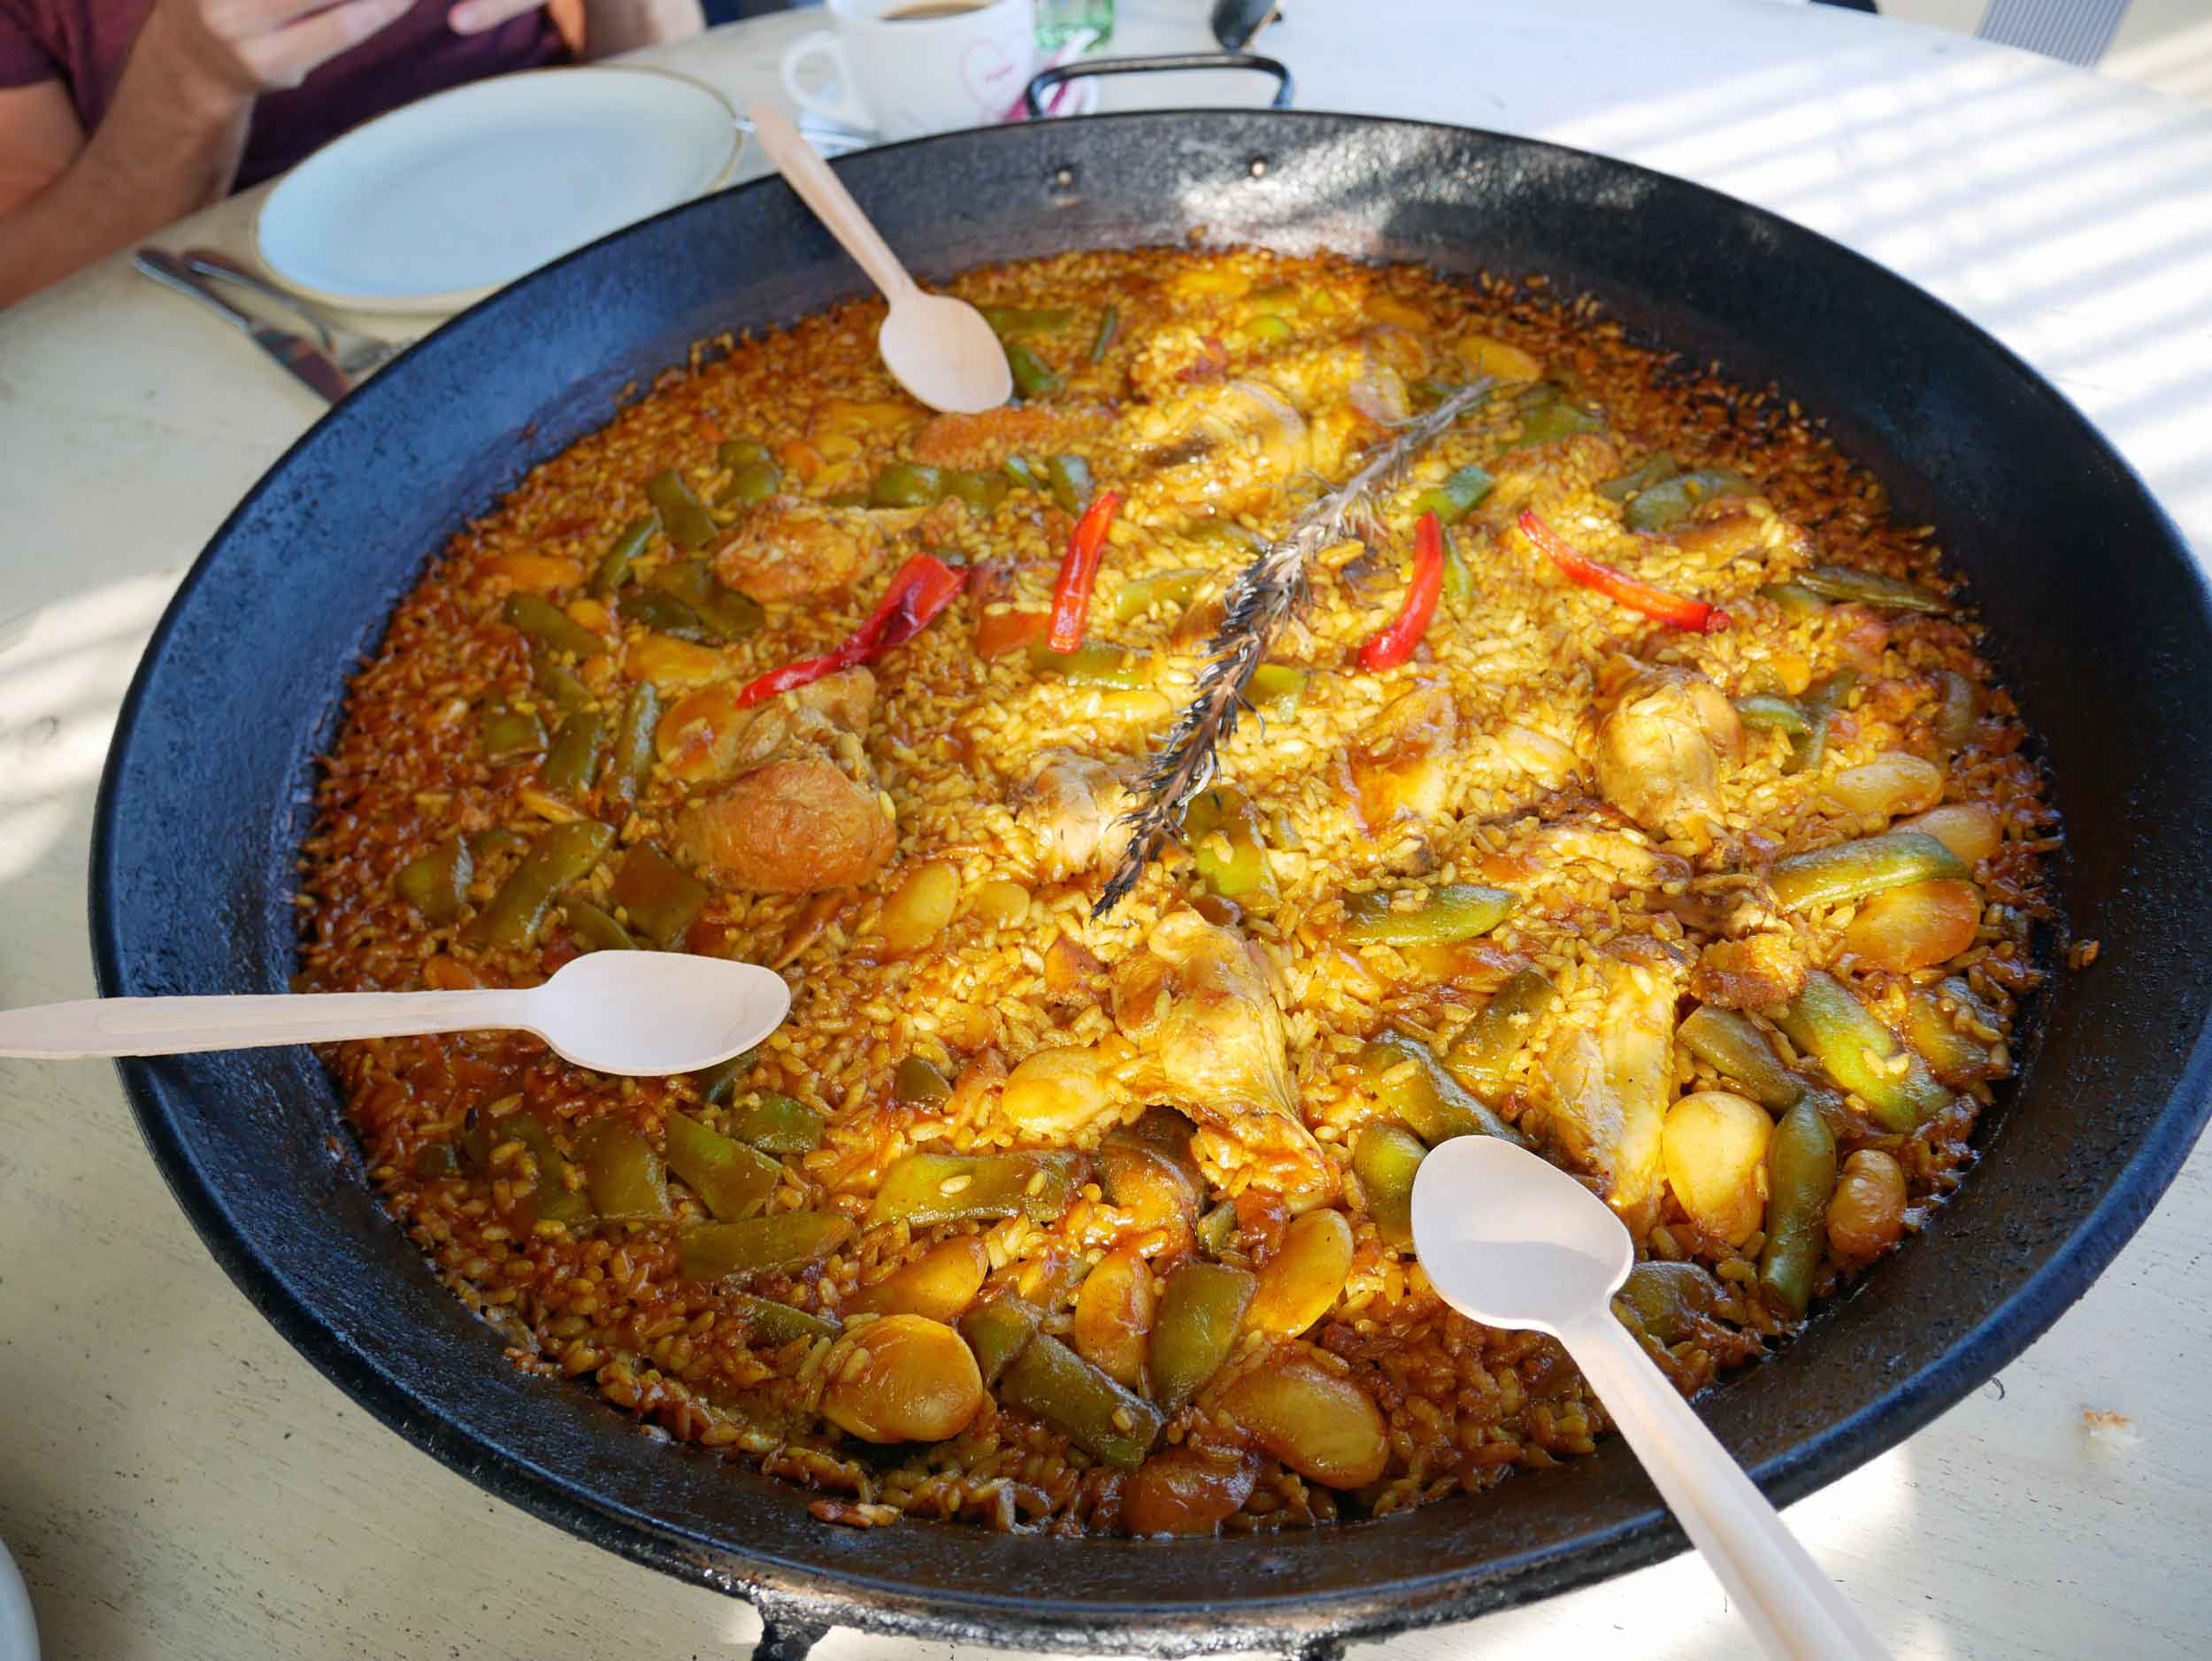 Valencia-style   paella  enjoyed with our friend Crystal at the fabulous seaside restaurant, Xiringuito Escriba.